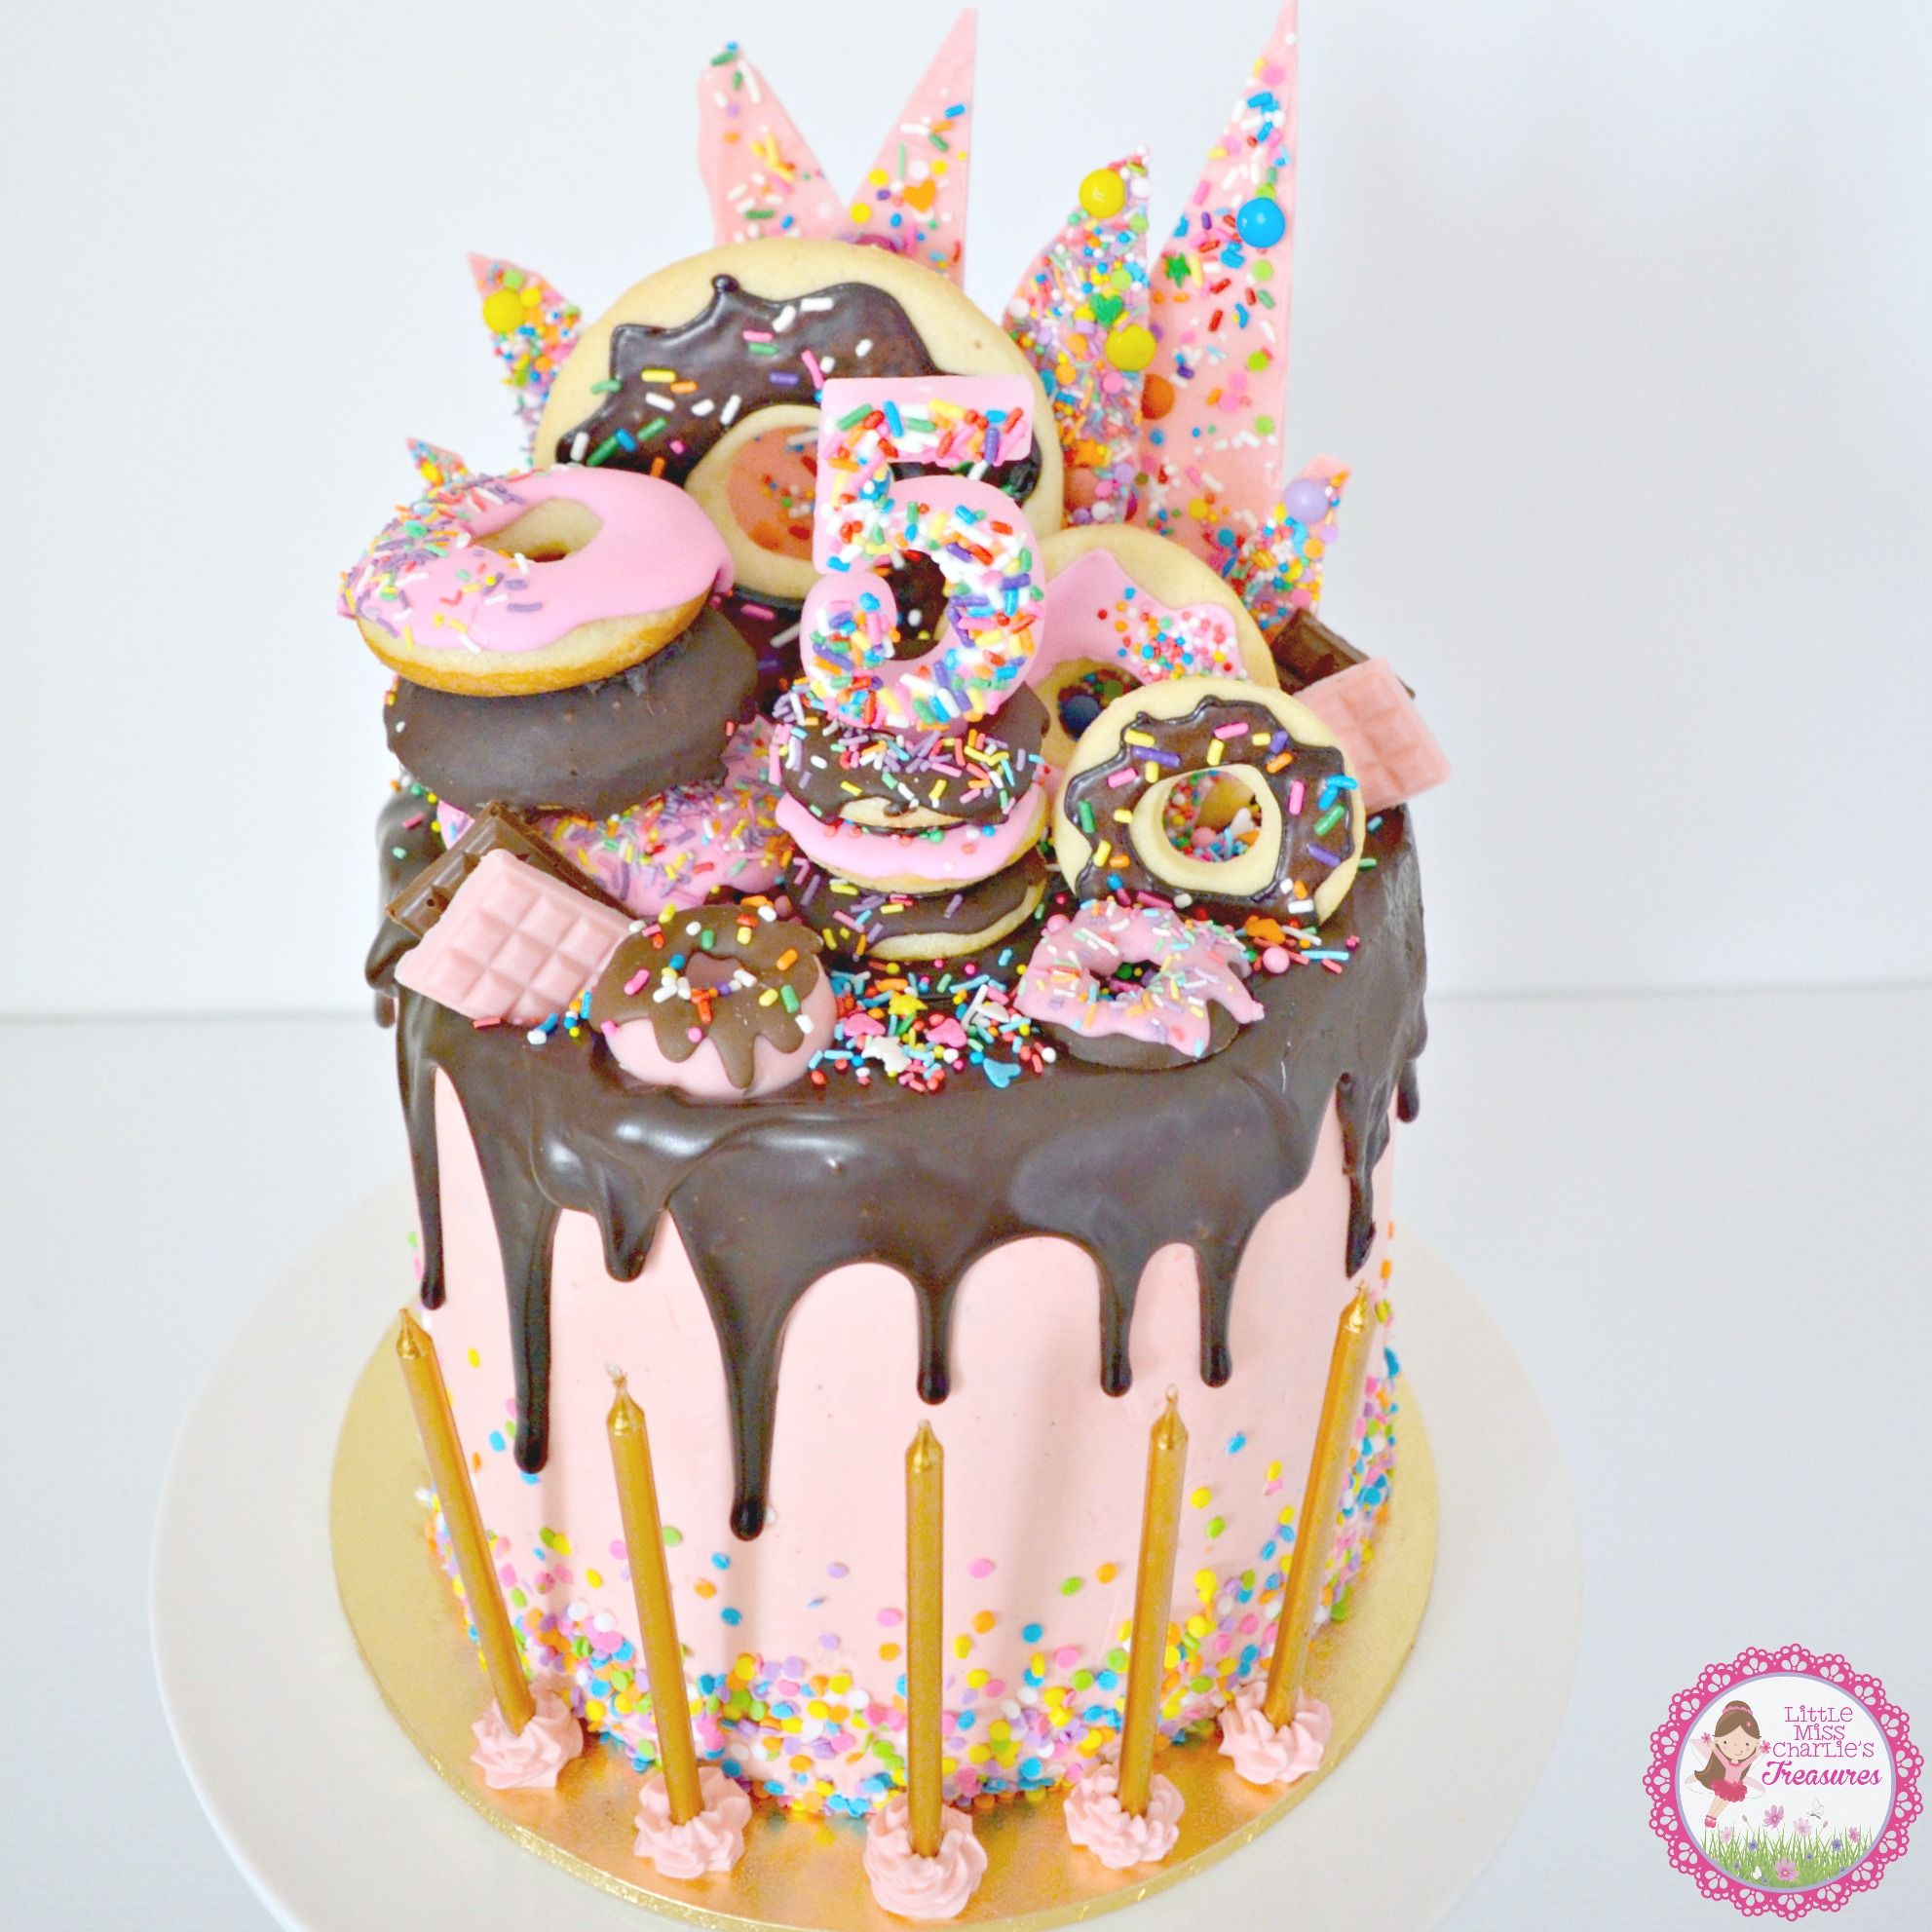 Donut & Sprinkles Birthday Cake - layers of chocolate ...